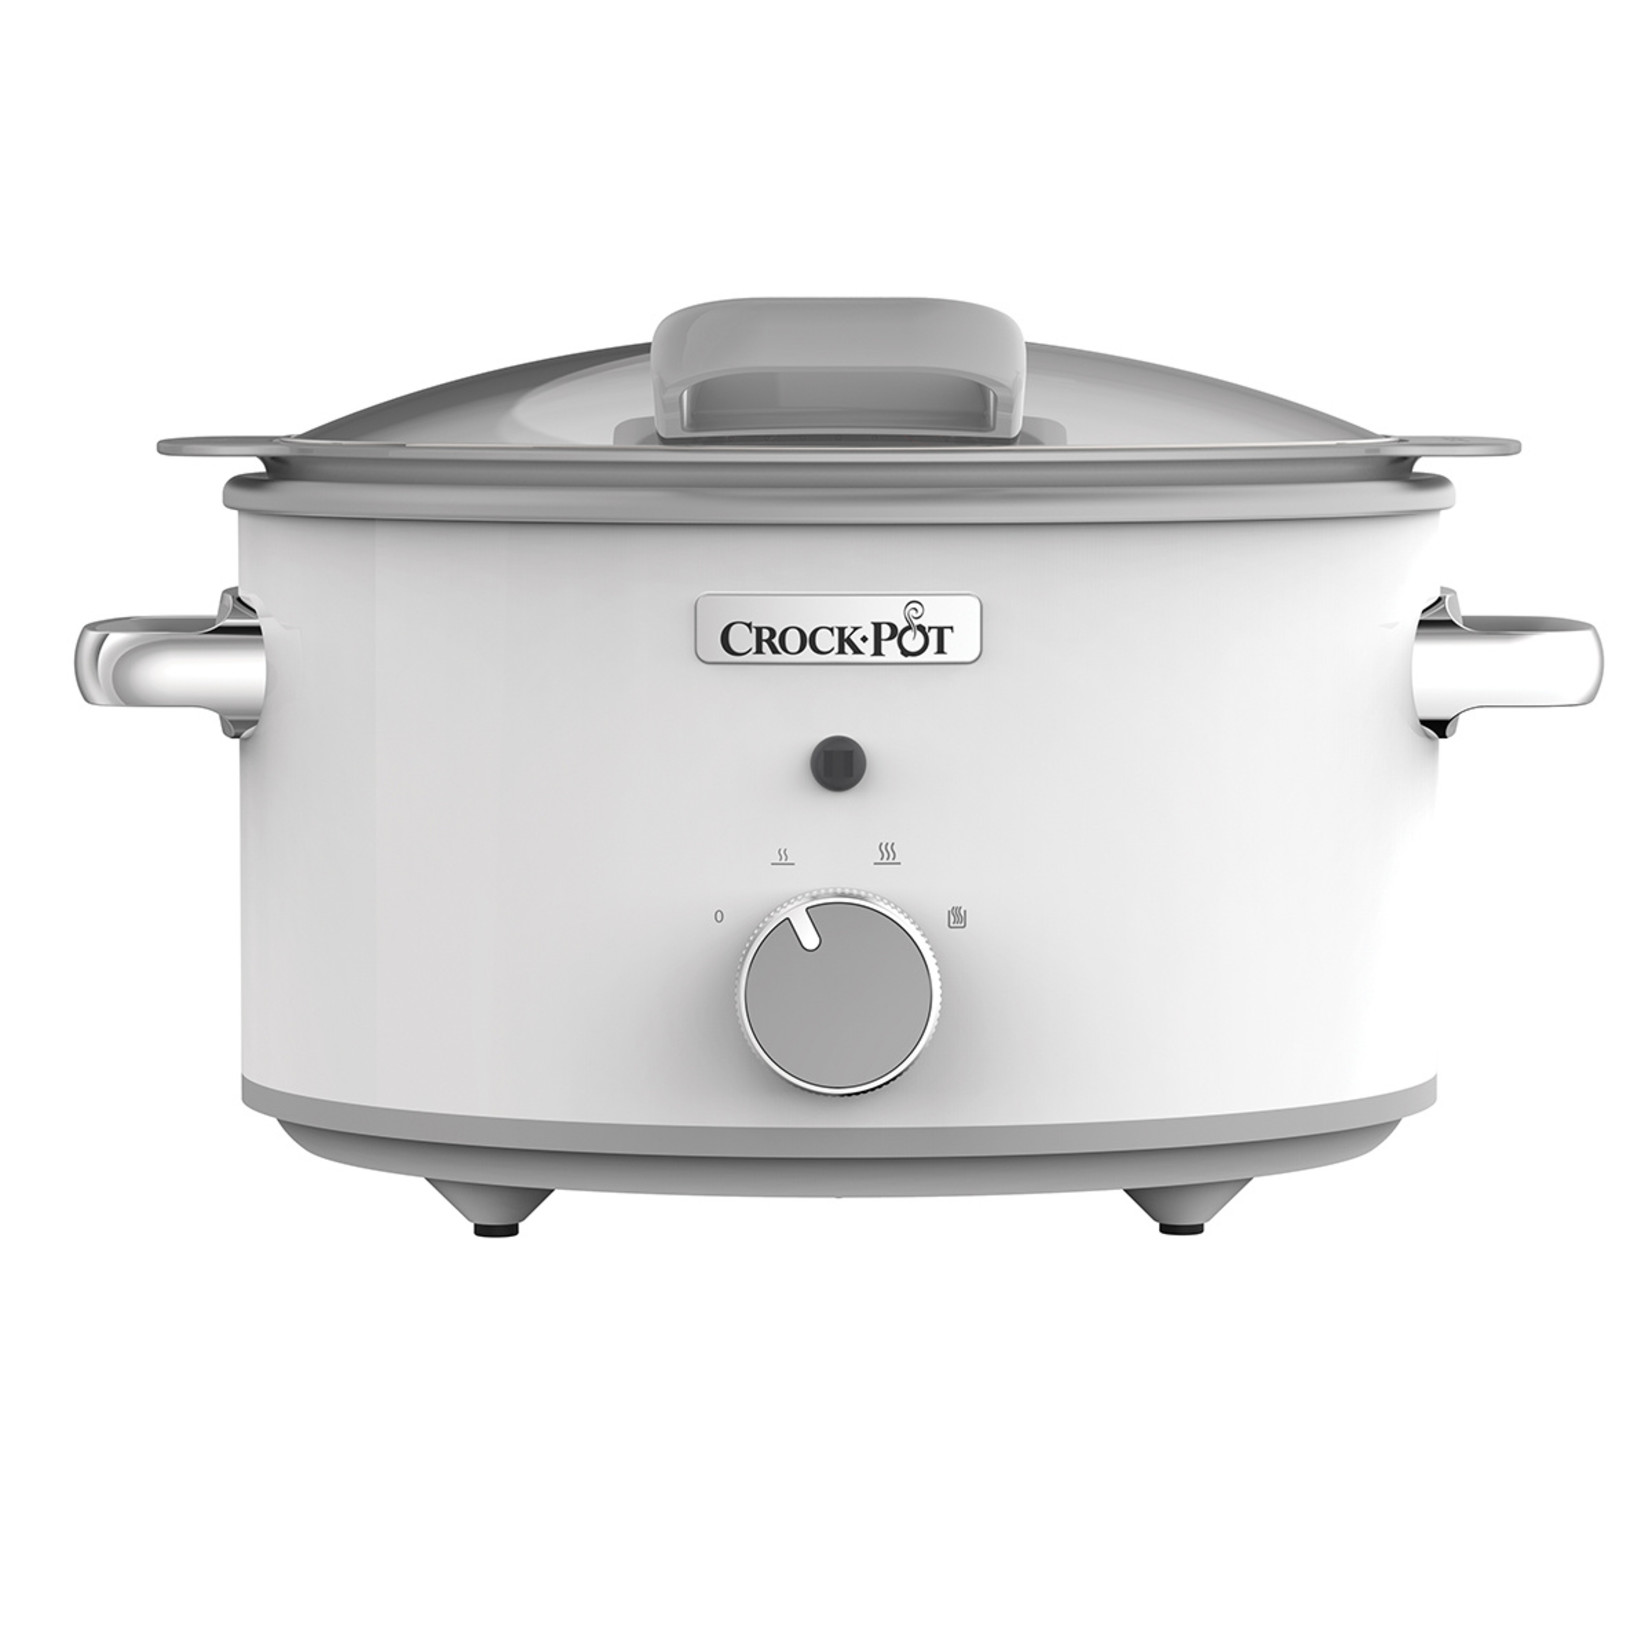 Crock-Pot Crock-Pot DuraCeramic slowcooker Saute 4,5L wit met klapdeksel